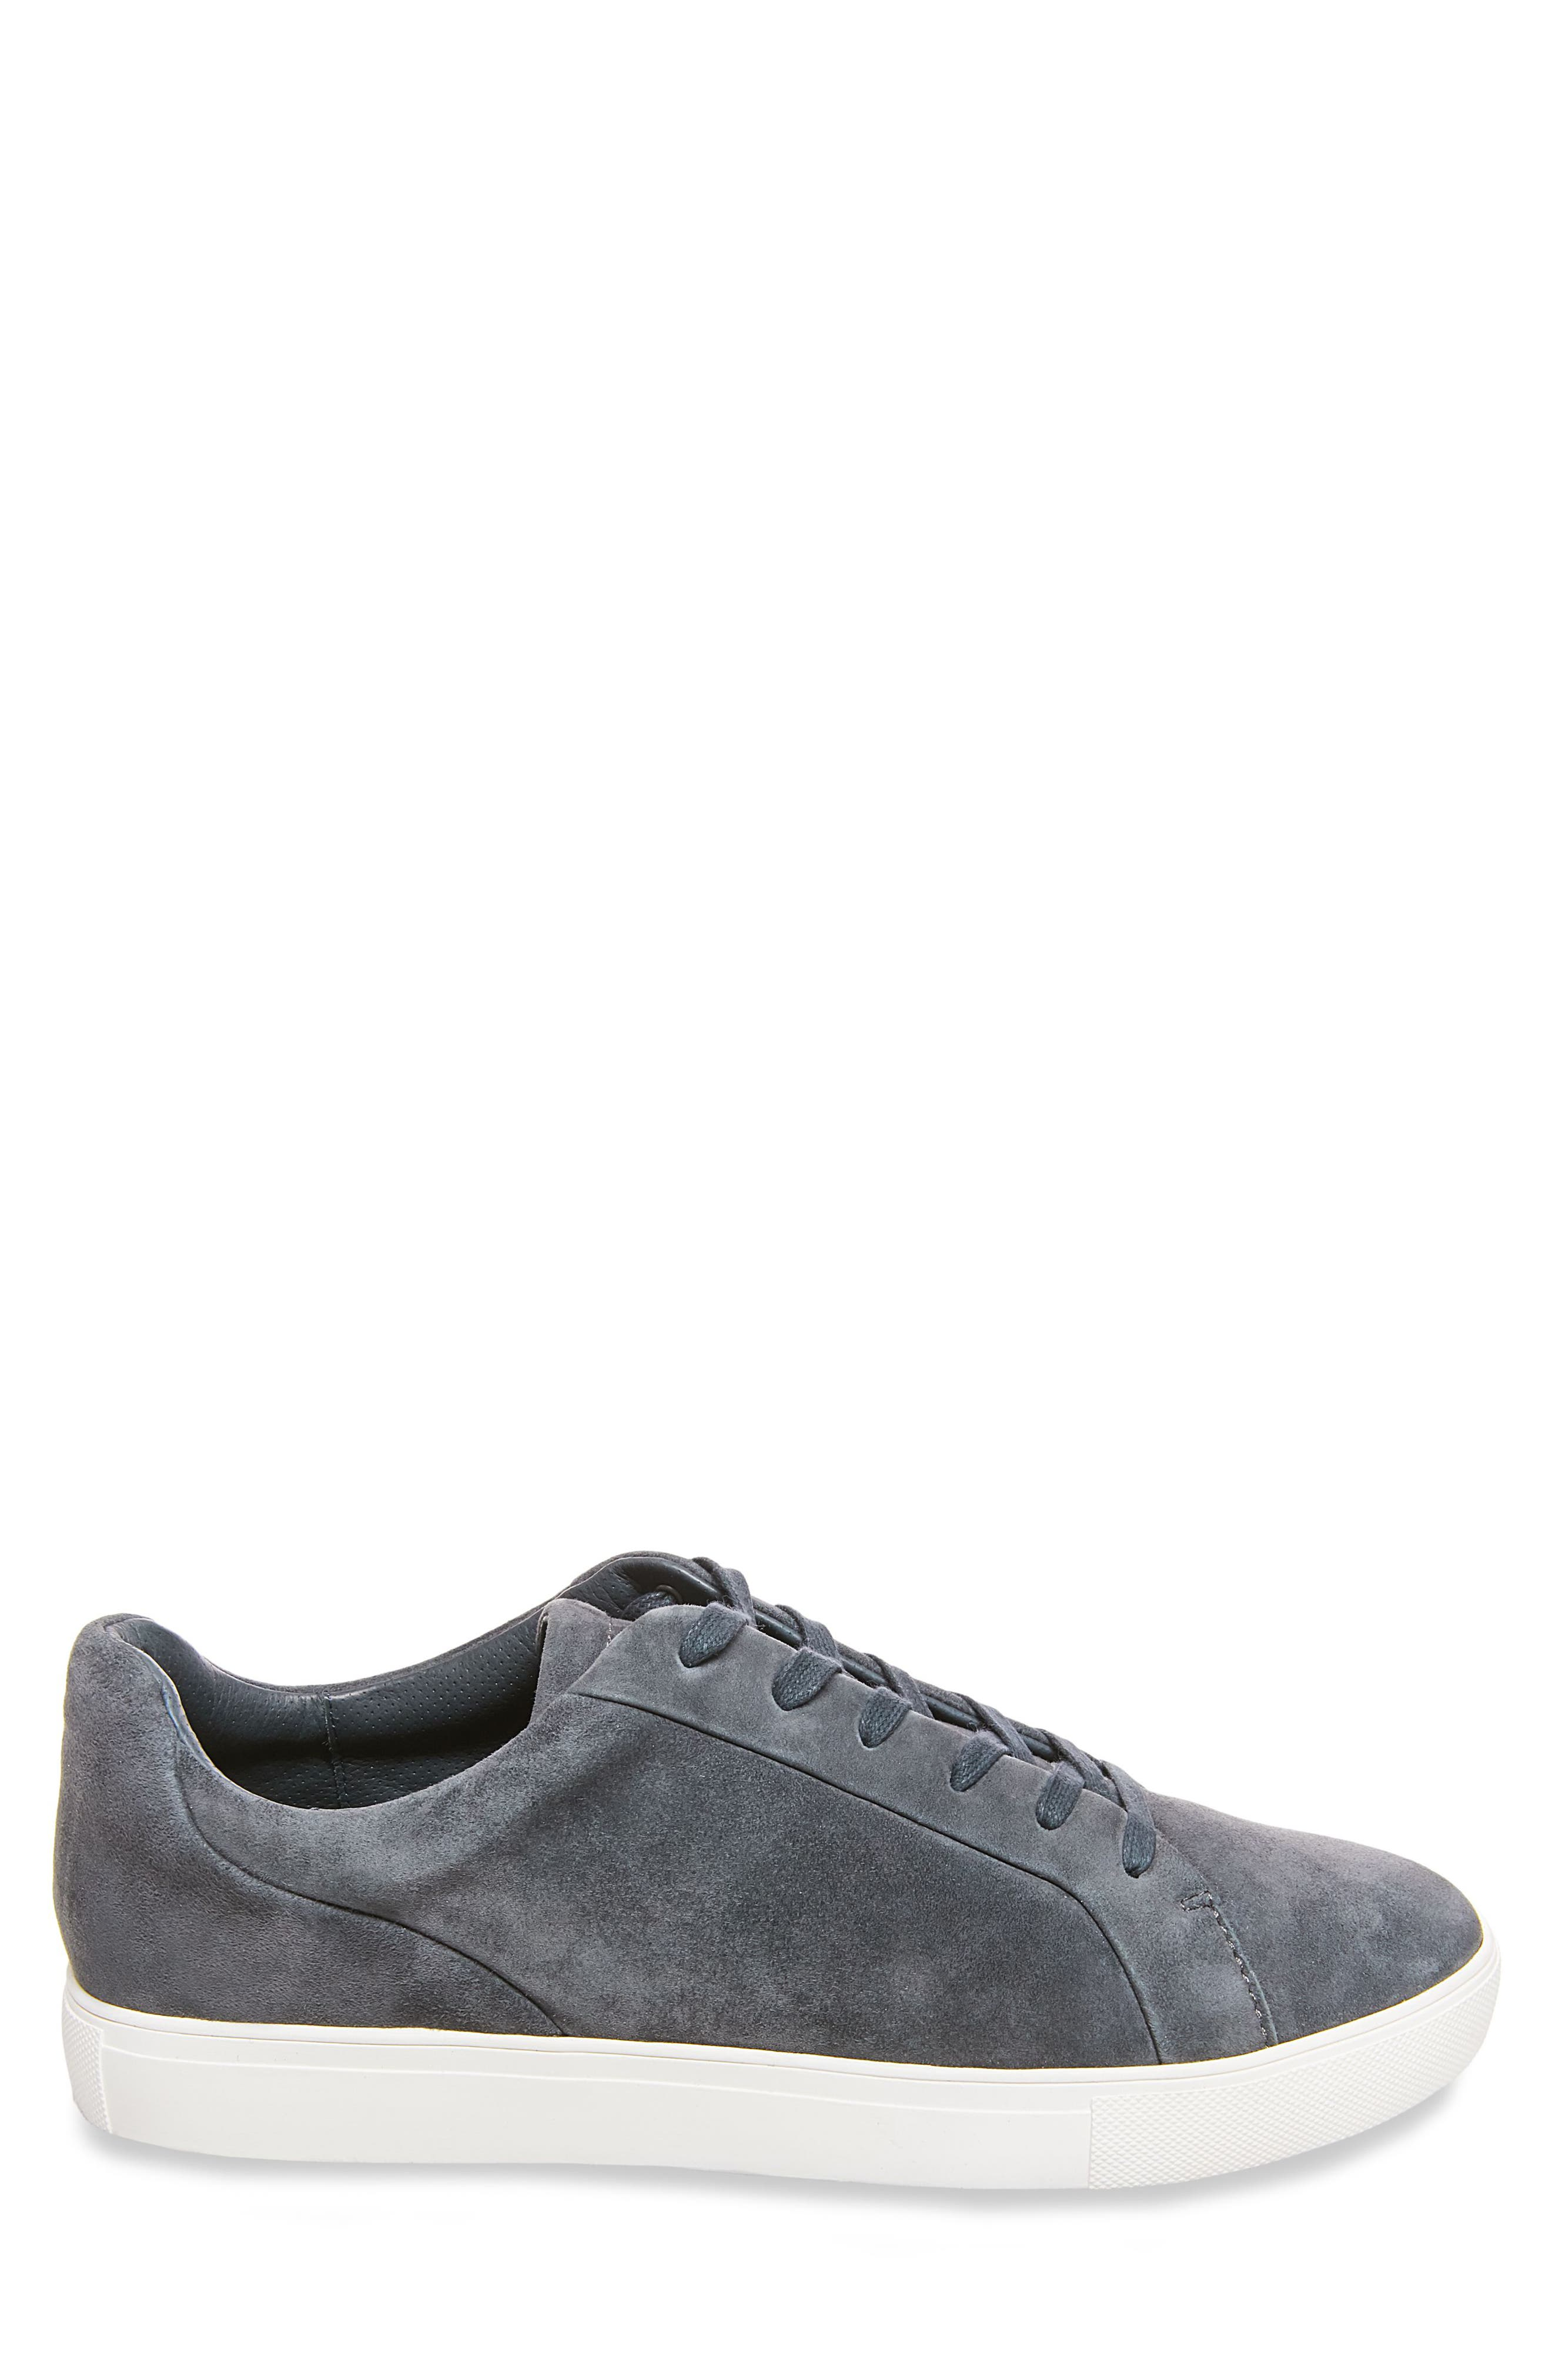 x GQ James Sneaker,                             Alternate thumbnail 3, color,                             020